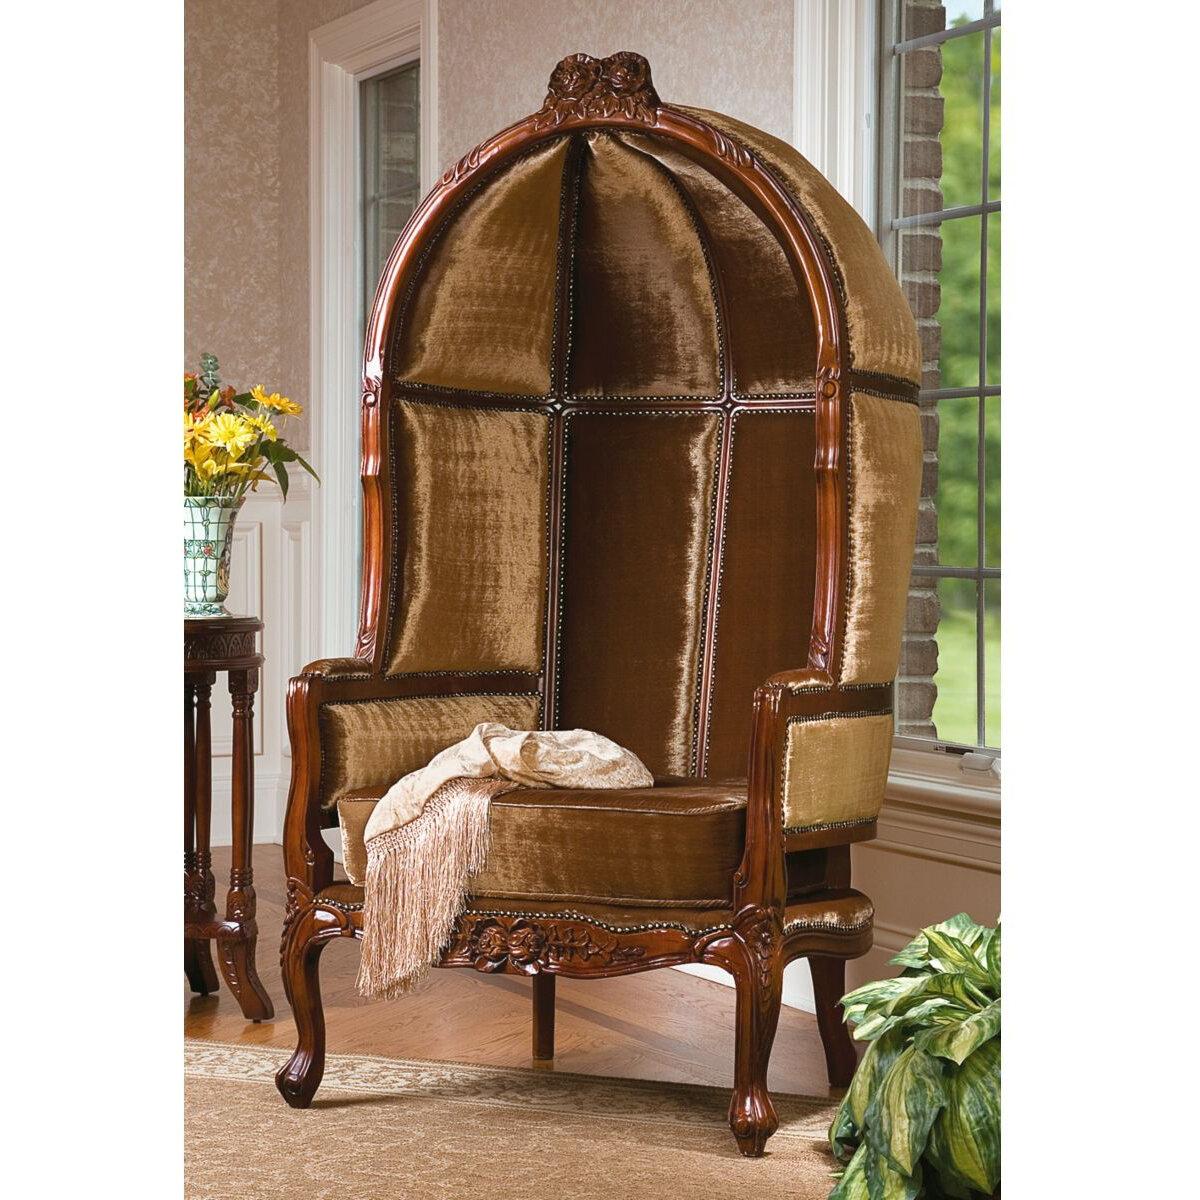 Genial Lady Alcott Victorian Balloon Fabric Balloon Chair. By Design Toscano